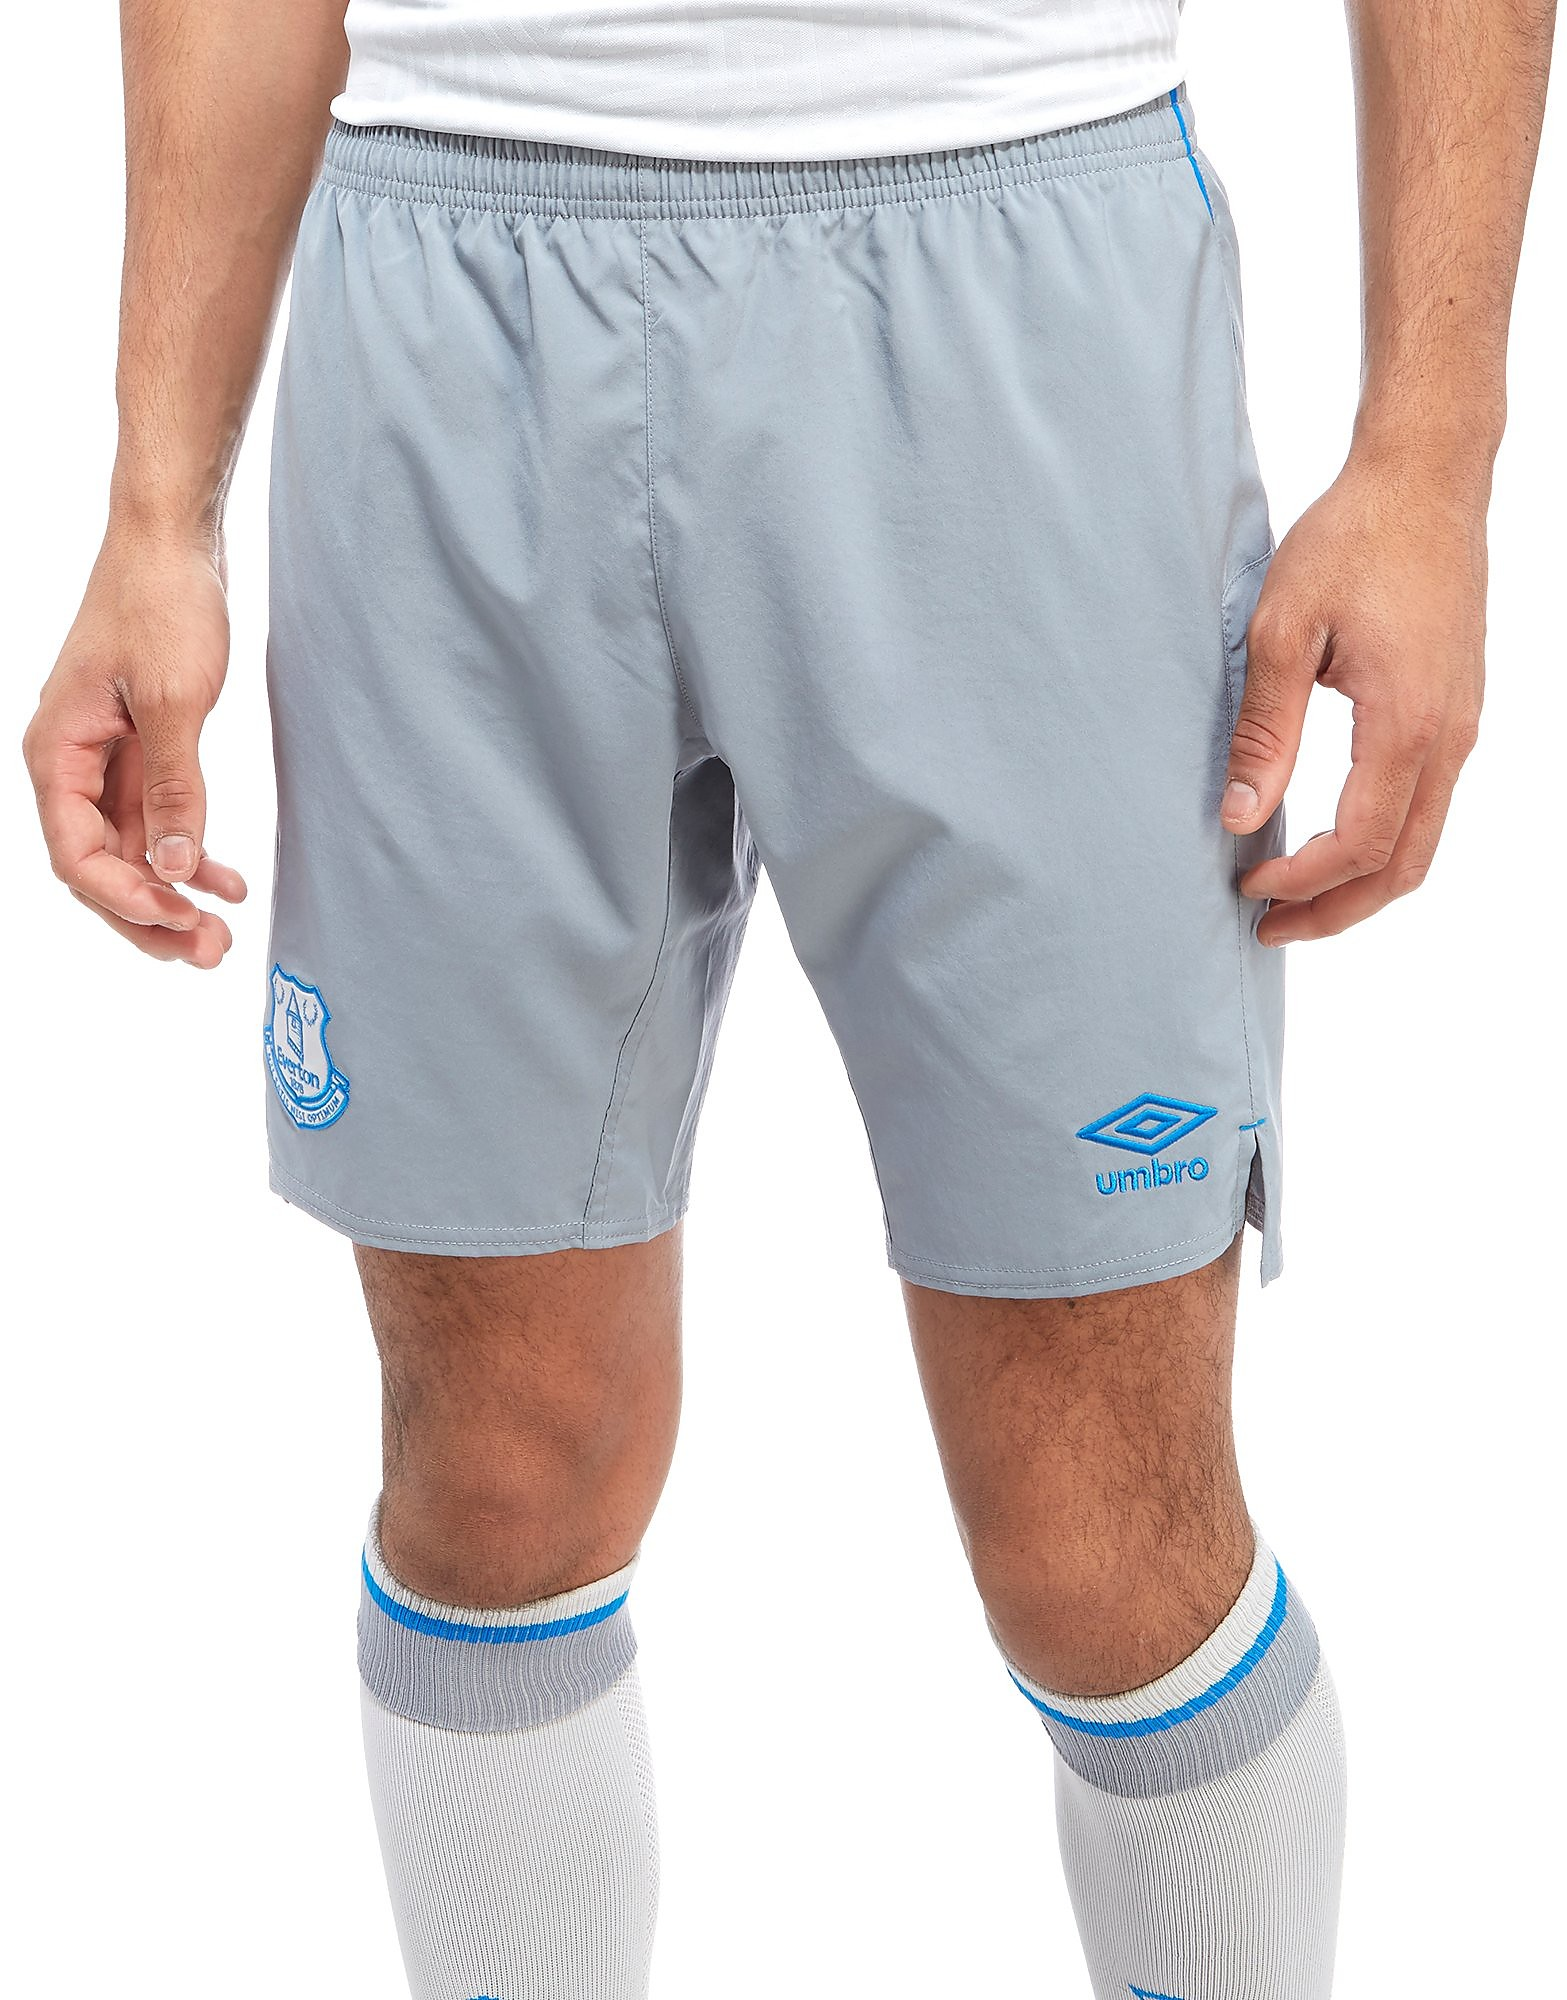 Umbro Everton FC 2017/18 Away Shorts